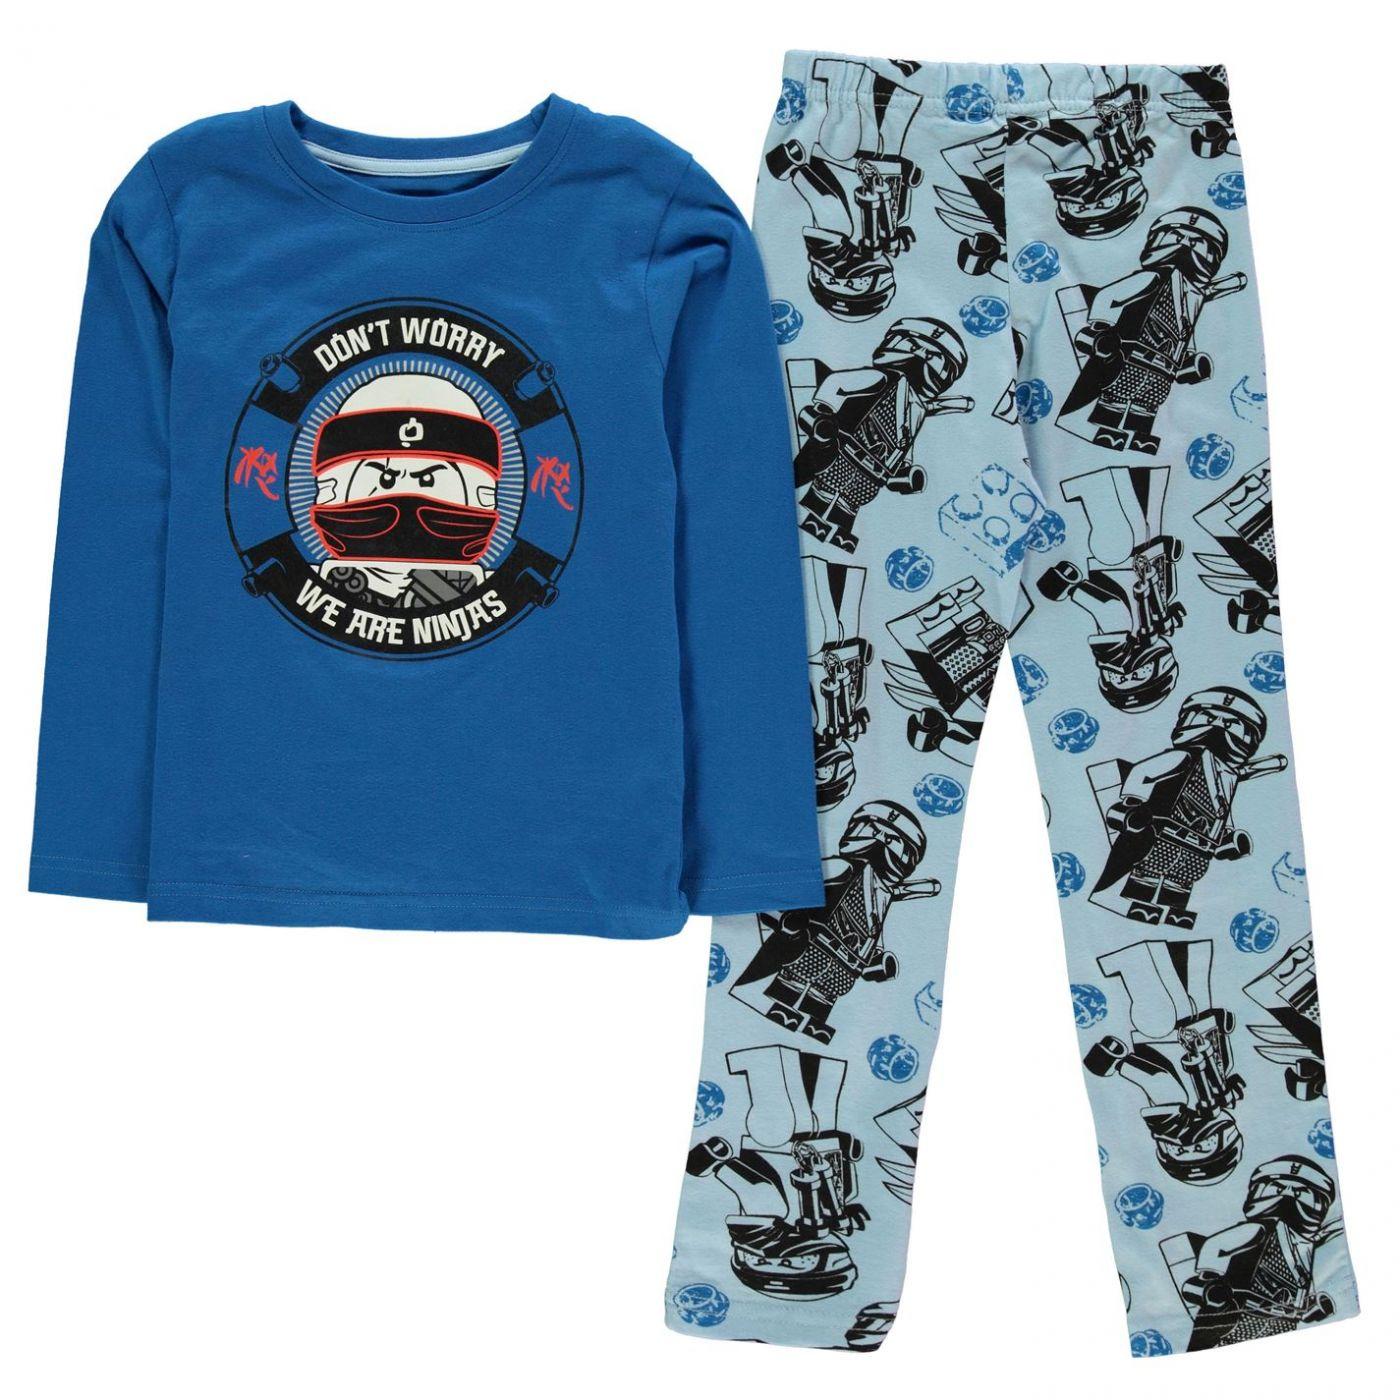 Lego Wear Pyjama Set Childrens